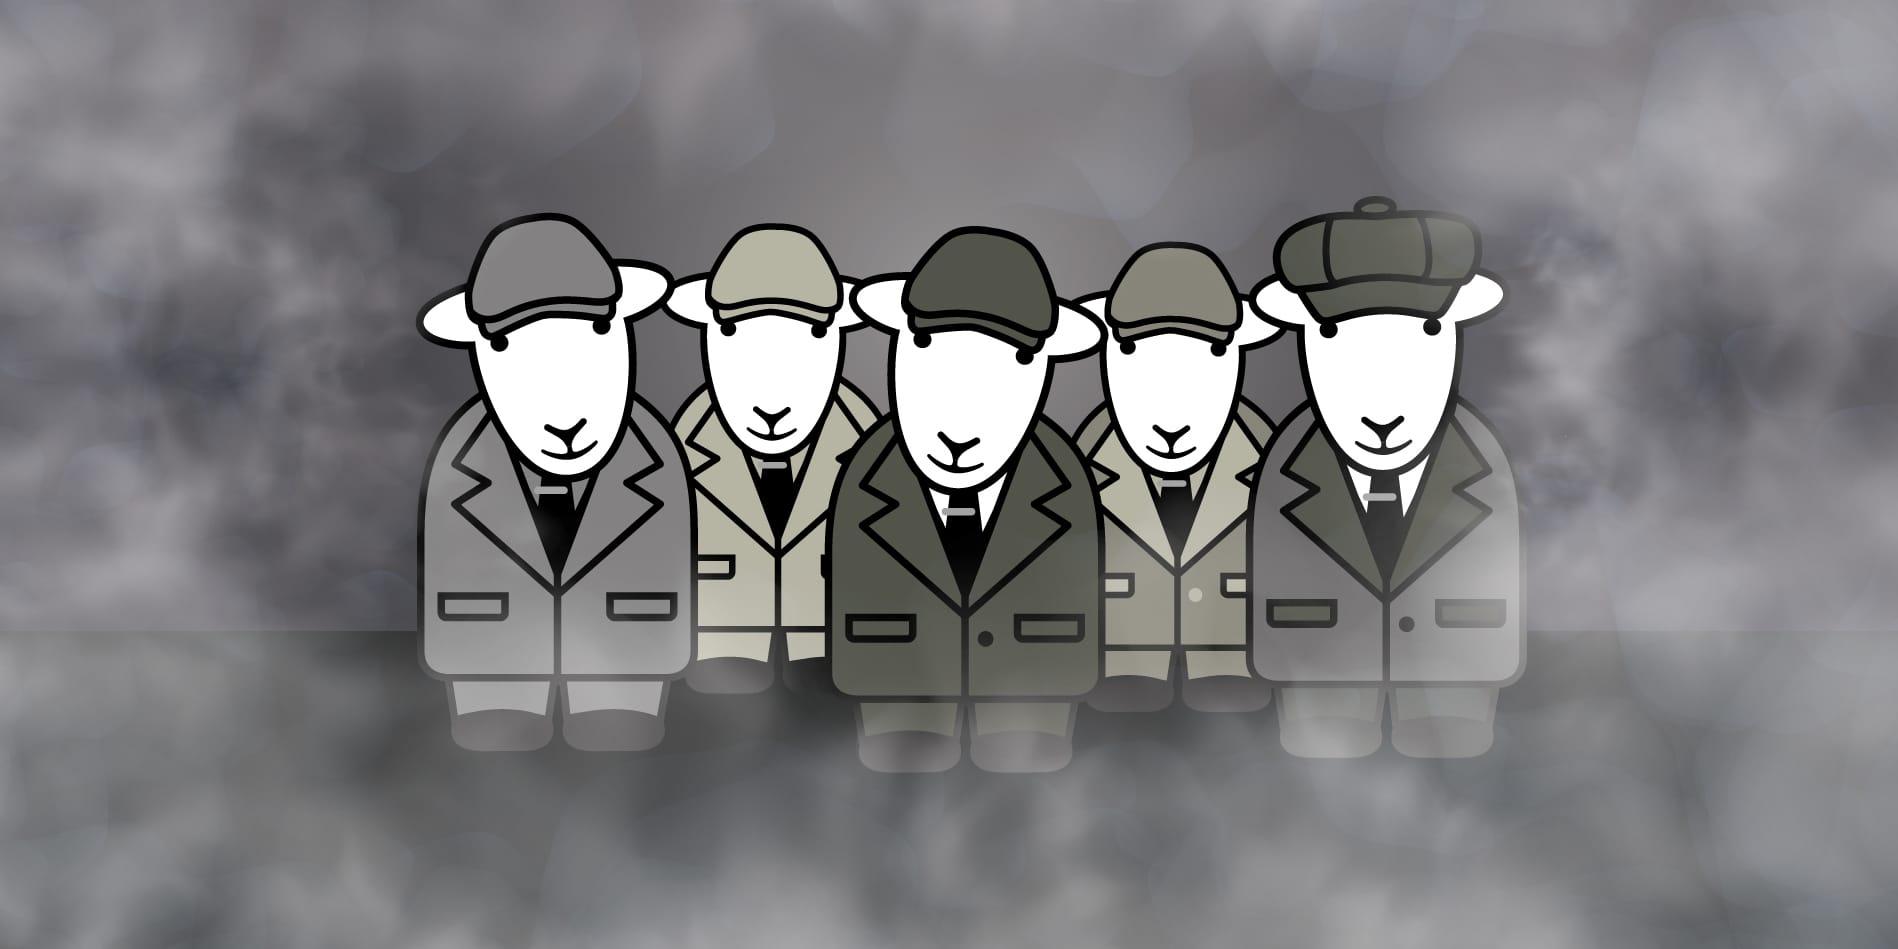 The Peaky Blinders Hat: What Is It?